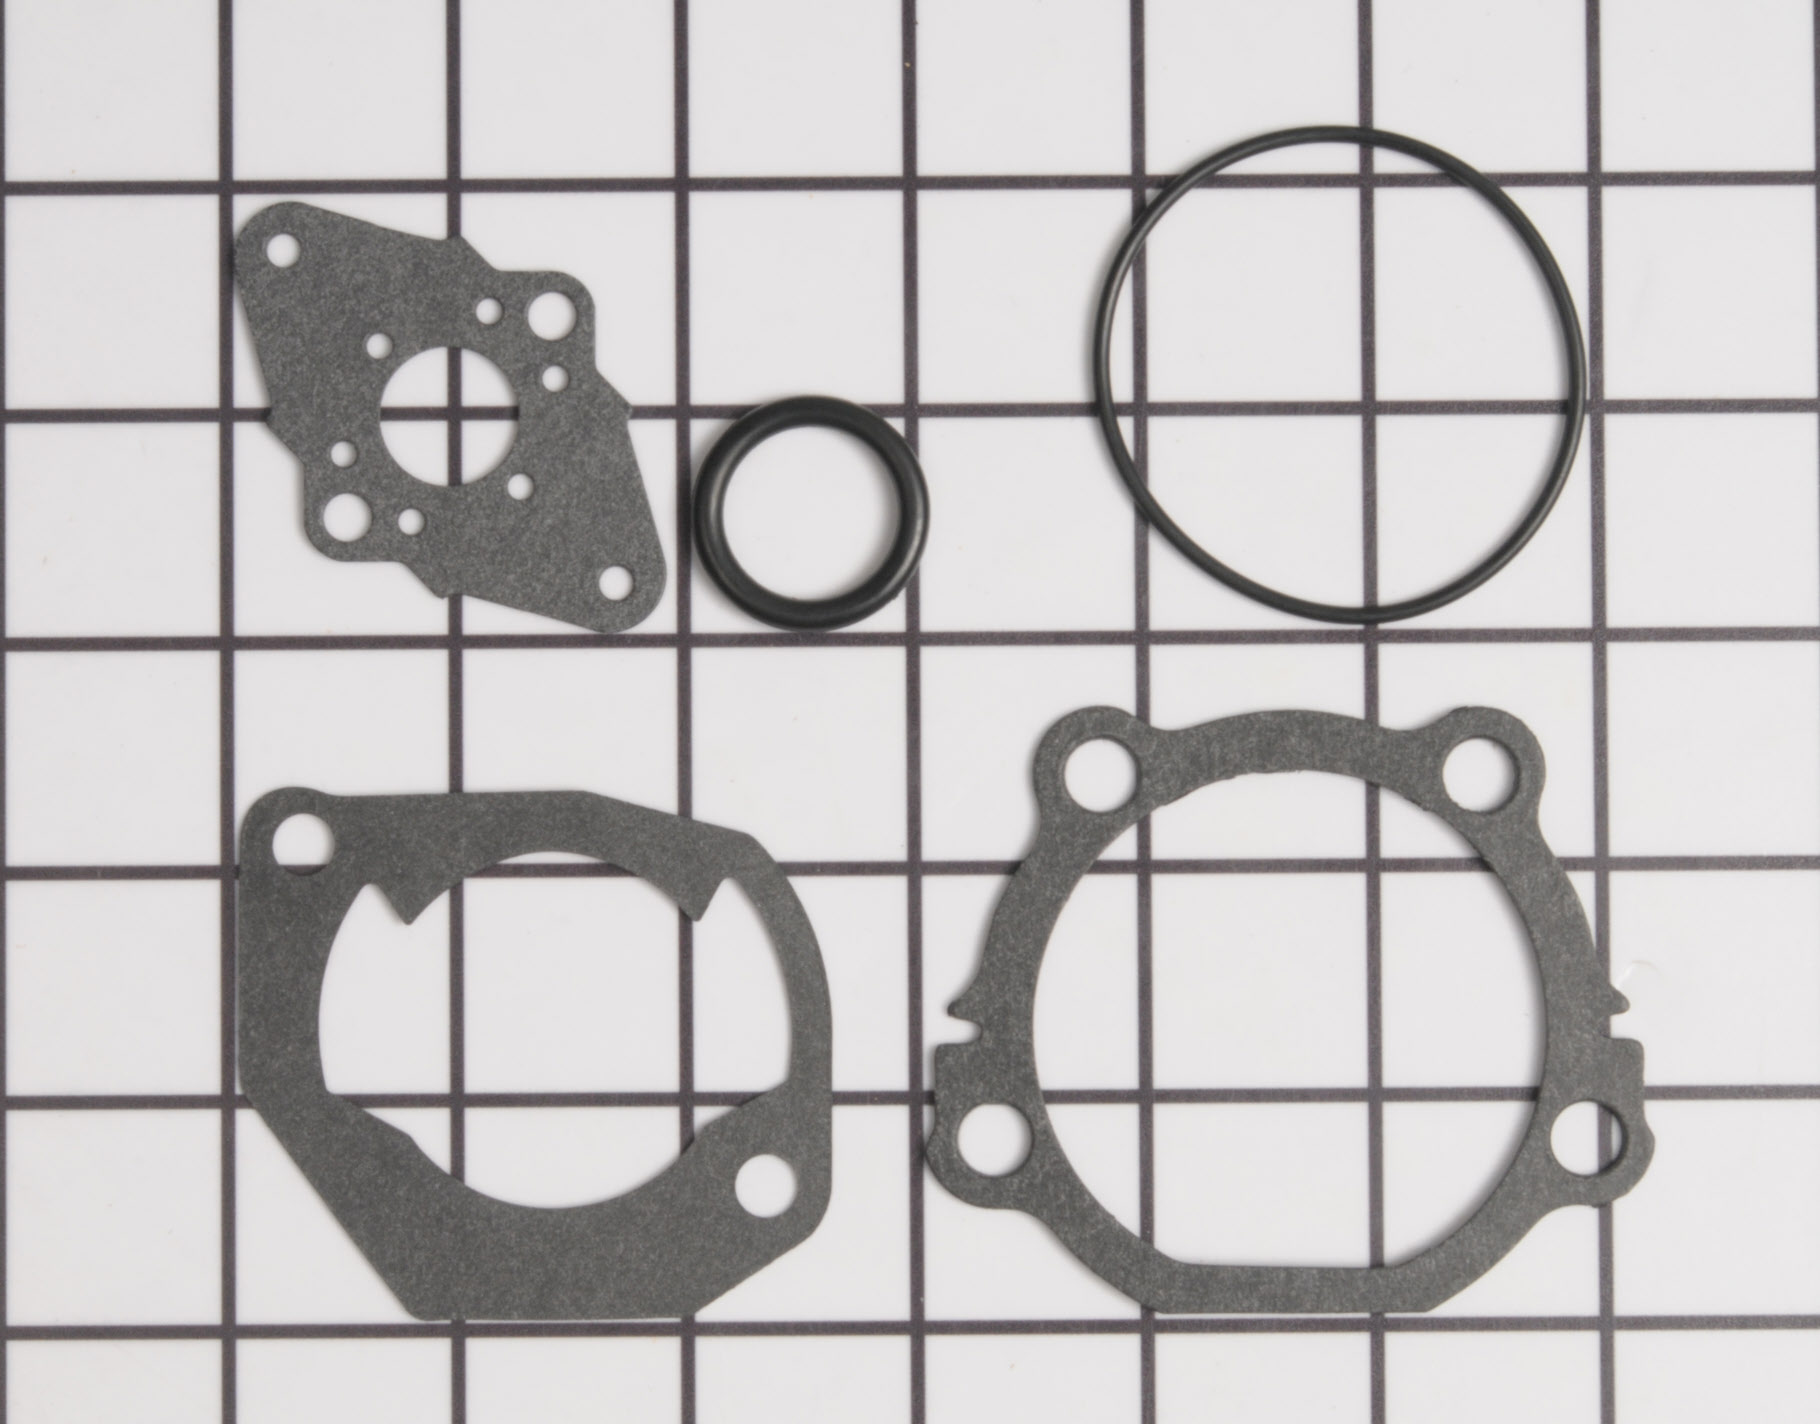 530069276 Paramount String Trimmer Part -Gasket Set